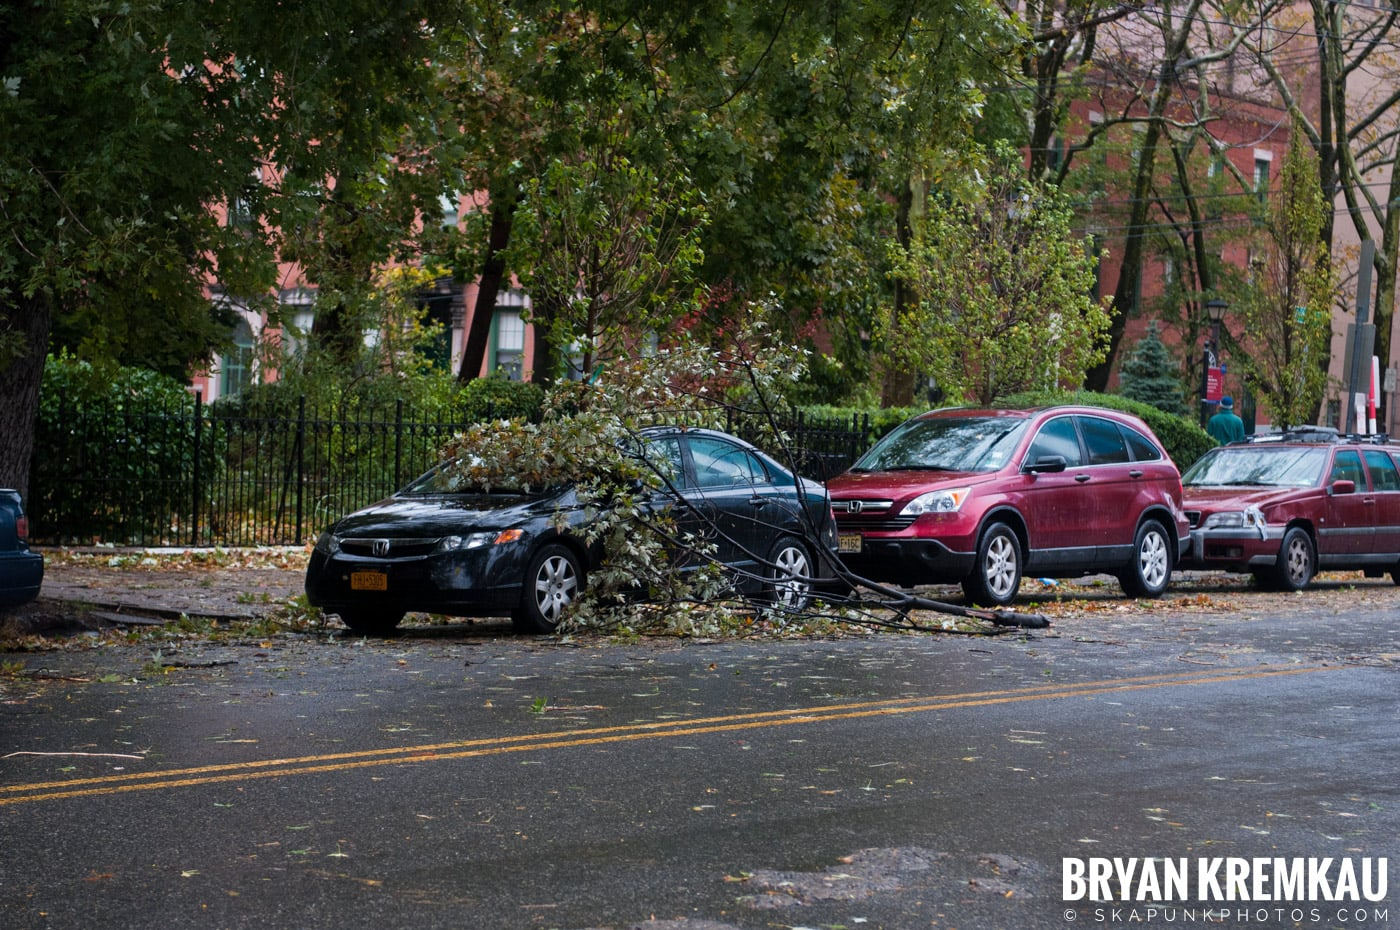 Hurricane Sandy 2012 @ Paulus Hook, Jersey City - 10.29.12 - 10.30.12 (32)